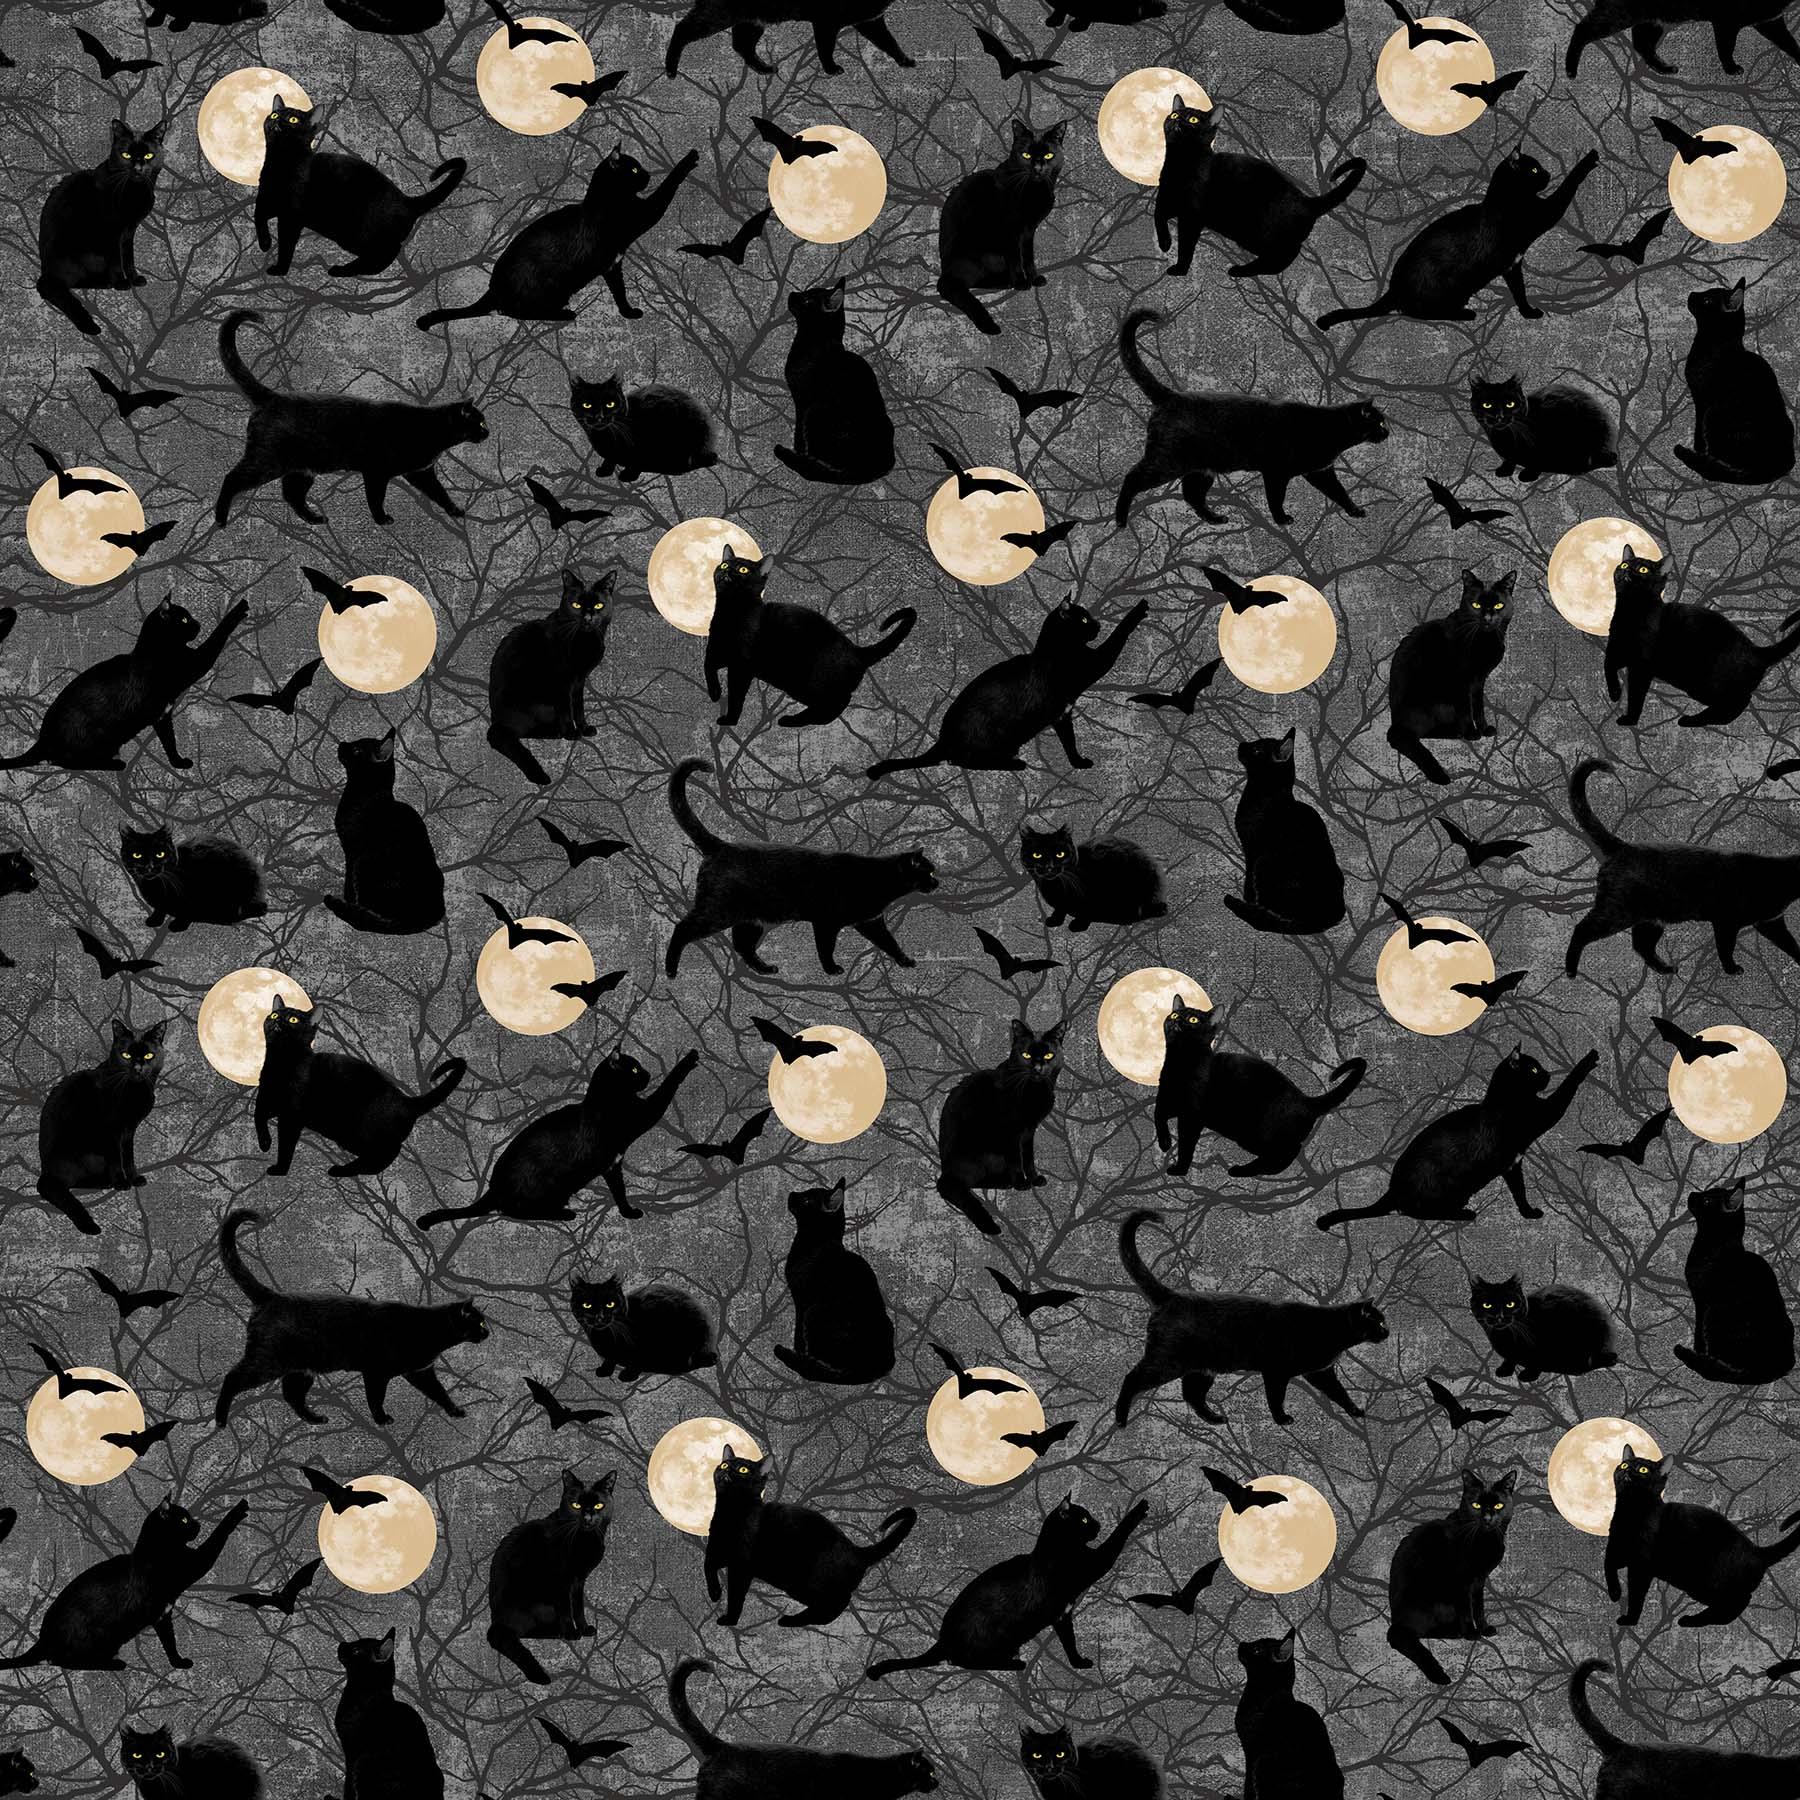 BLACK CAT CAPERS CATS CHASING MOON DARK GRAY